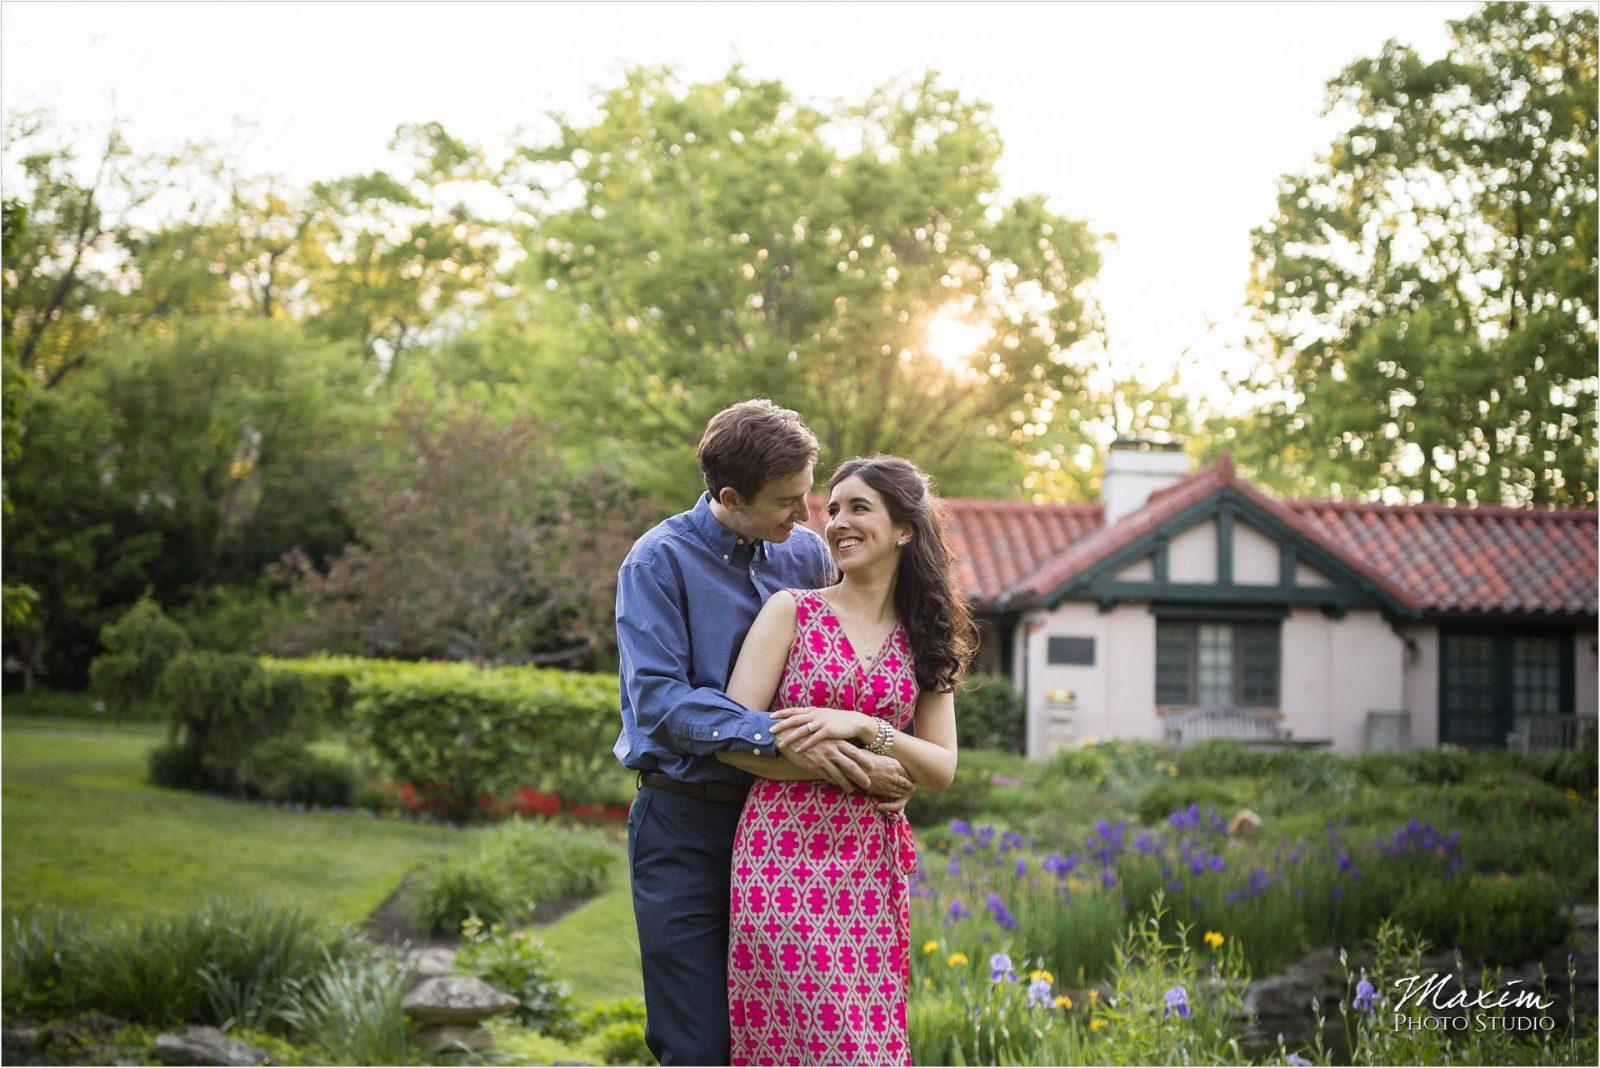 Smith Gardens Dayton Ohio engagement wedding couple